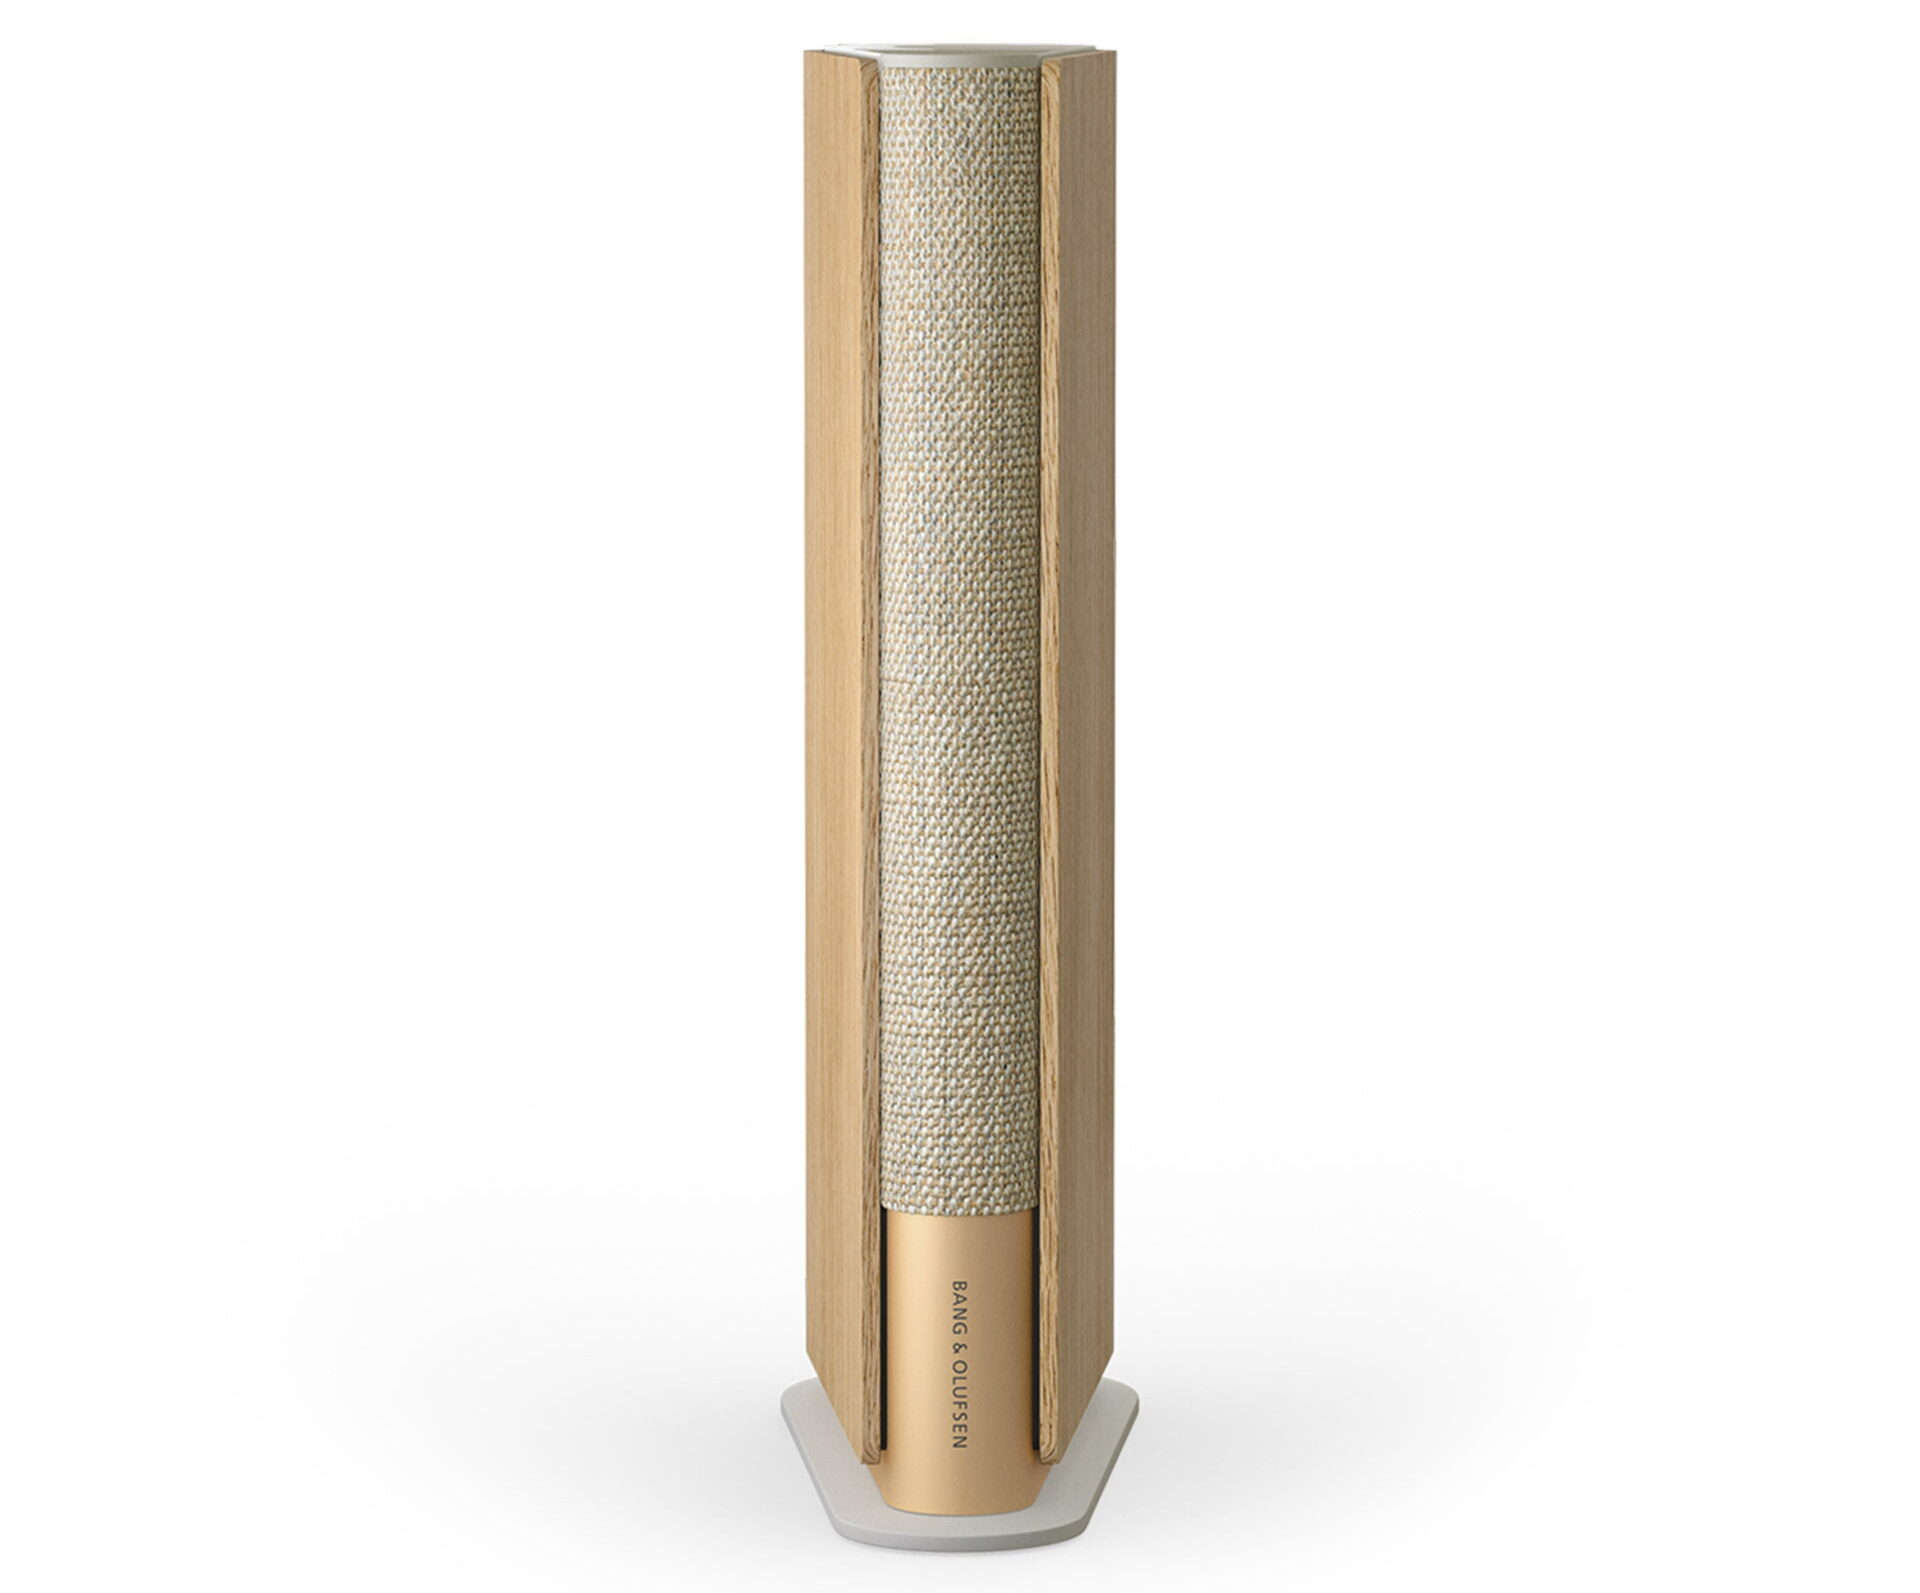 Bang & Olufsen's Beosound Emerge speaker.